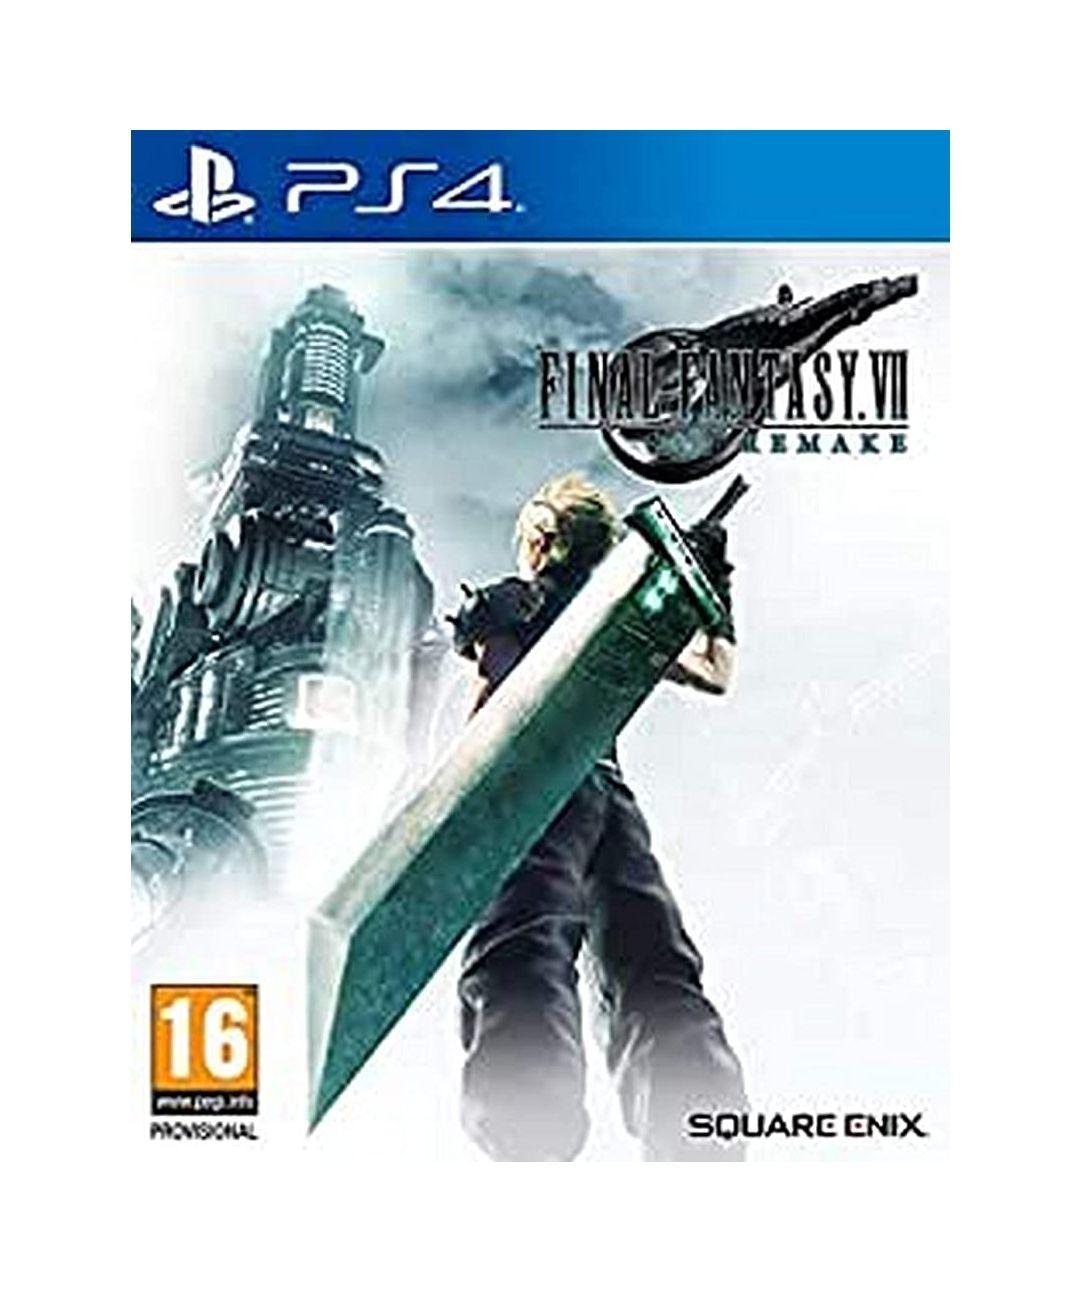 Final Fantasy VII Remake PS4 (Amazon)